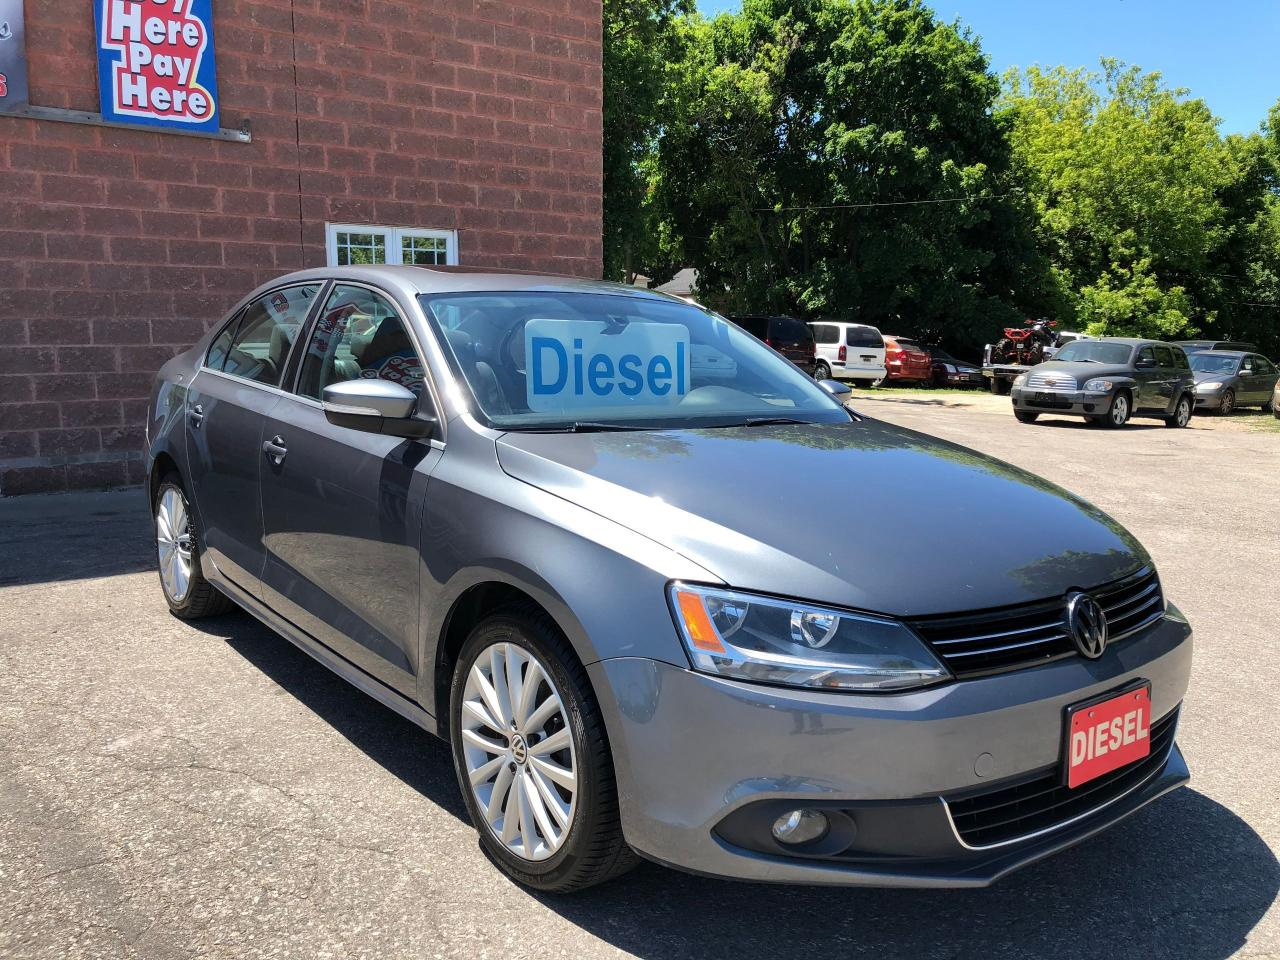 2013 Volkswagen Jetta TDI/DIESEL/NO ACCIDENT/CERTIFIED/WARRANTY INCLUDED